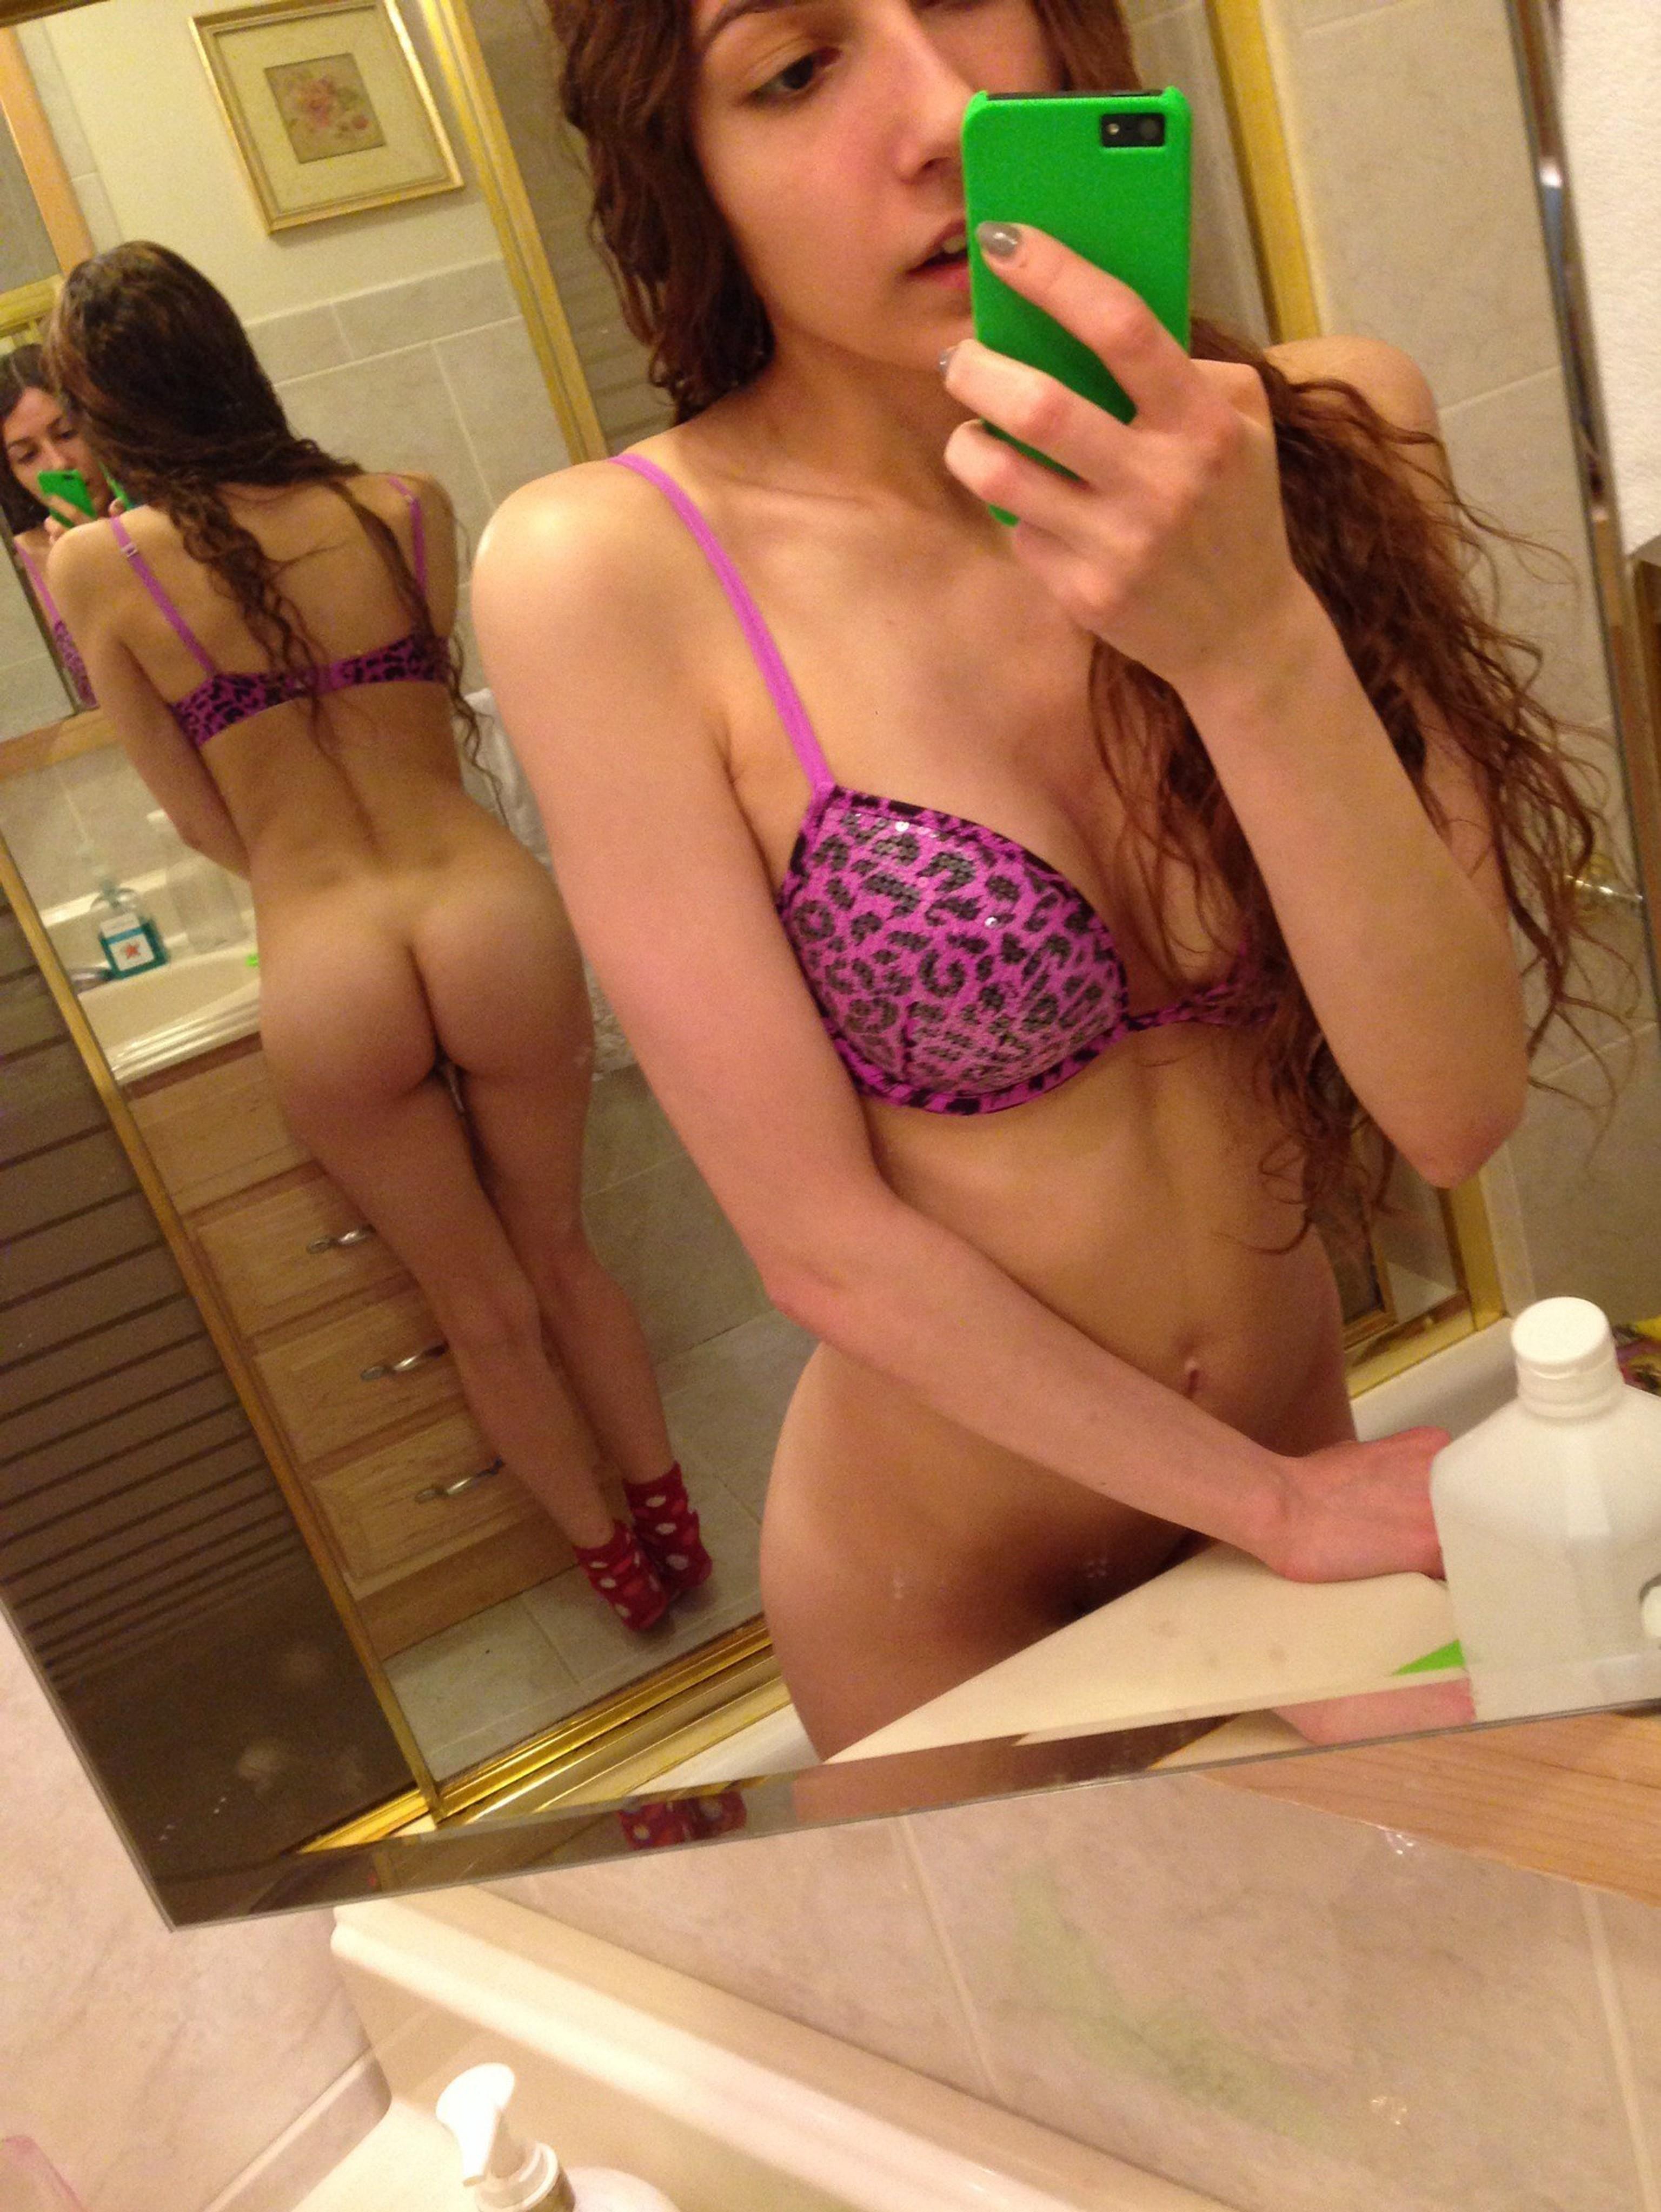 young lesbian naked selfpics